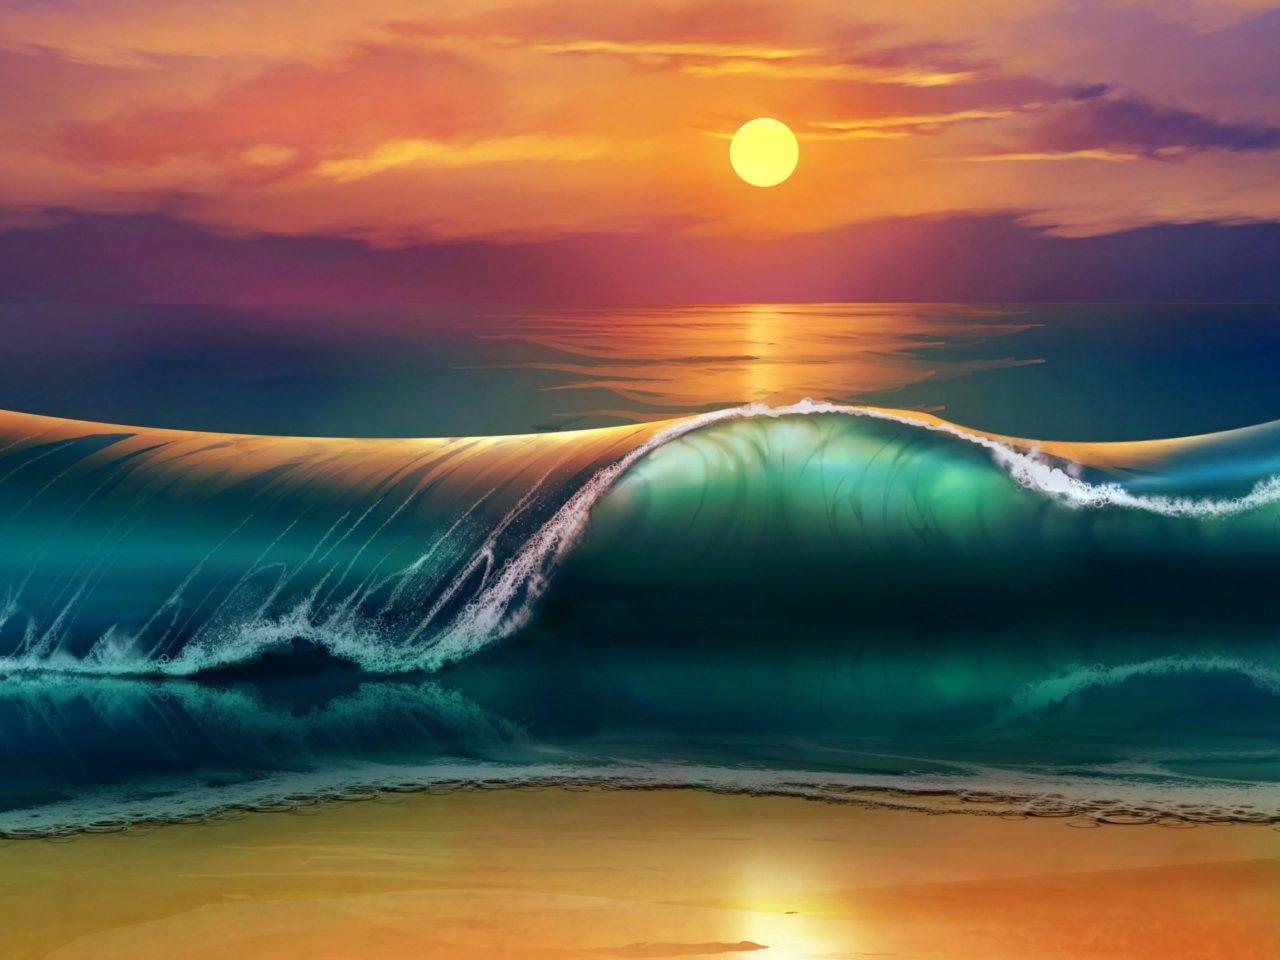 Hd Cars Wallpaper Iphone Sunset Sea Waves Beach 4k Ultra Hd Wallpapers For Desktop